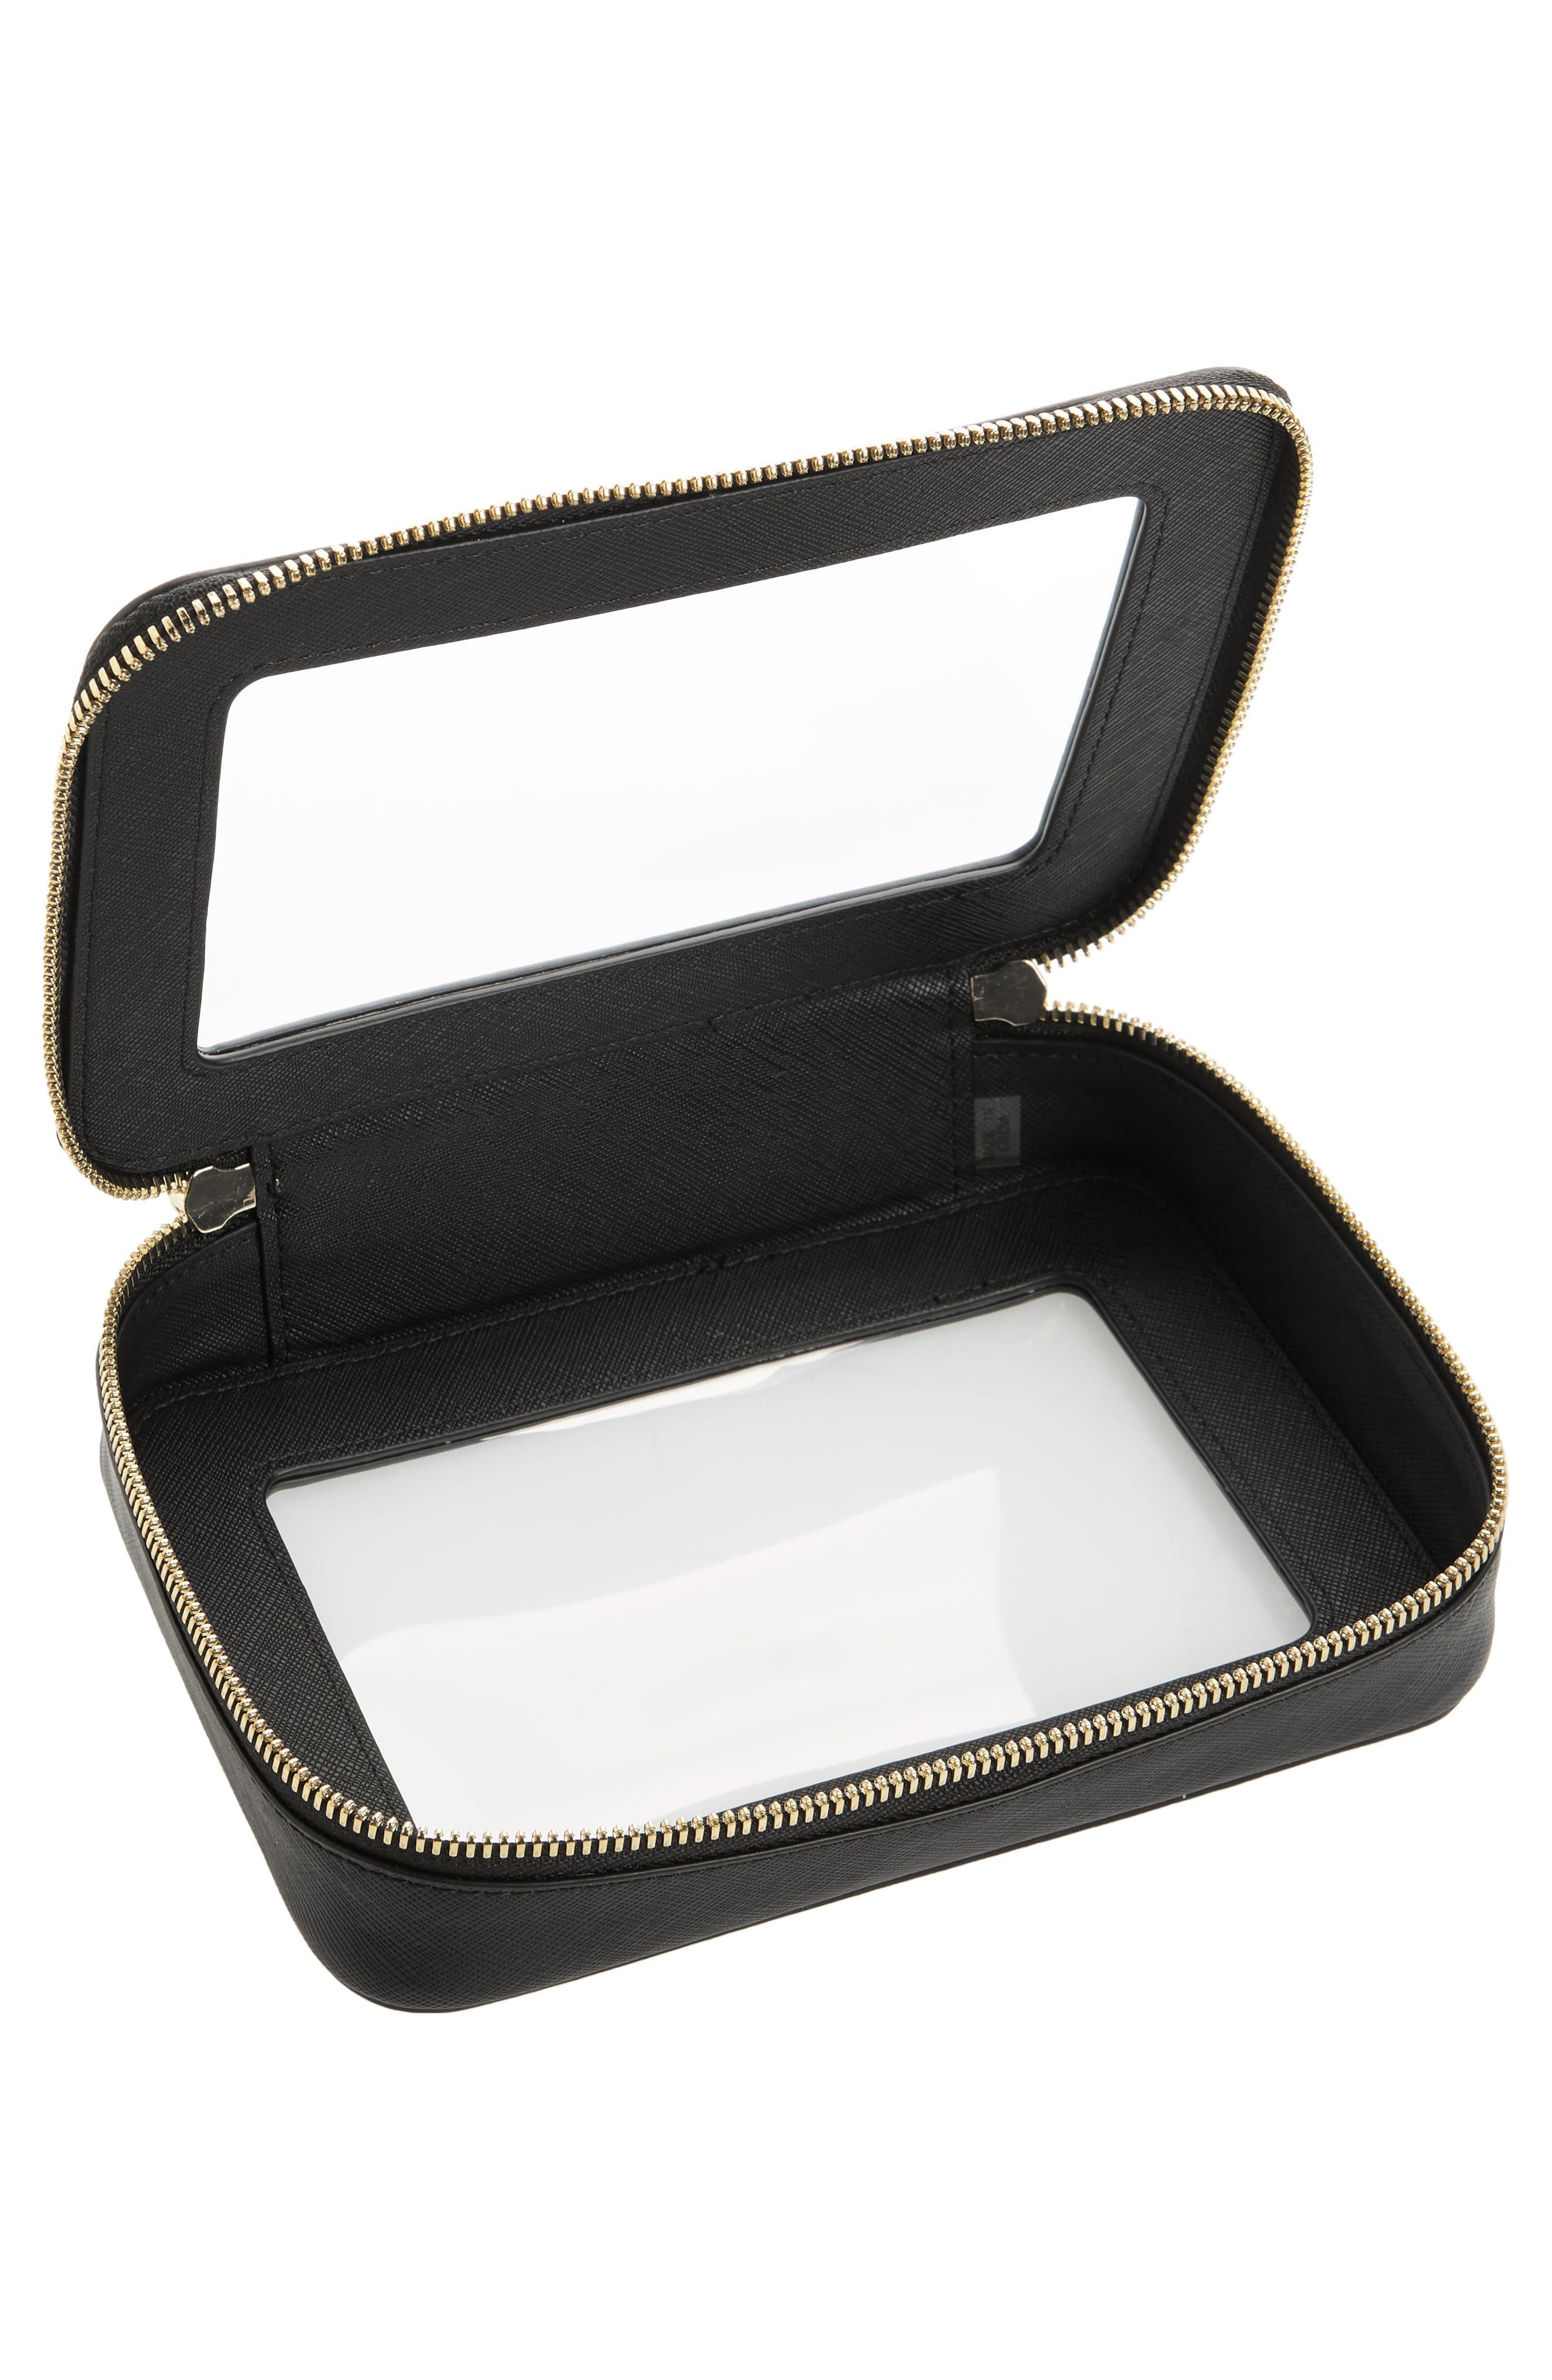 TRUFFLE, Clarity Jetset Cosmetics Case, Alternate thumbnail 3, color, BLACK